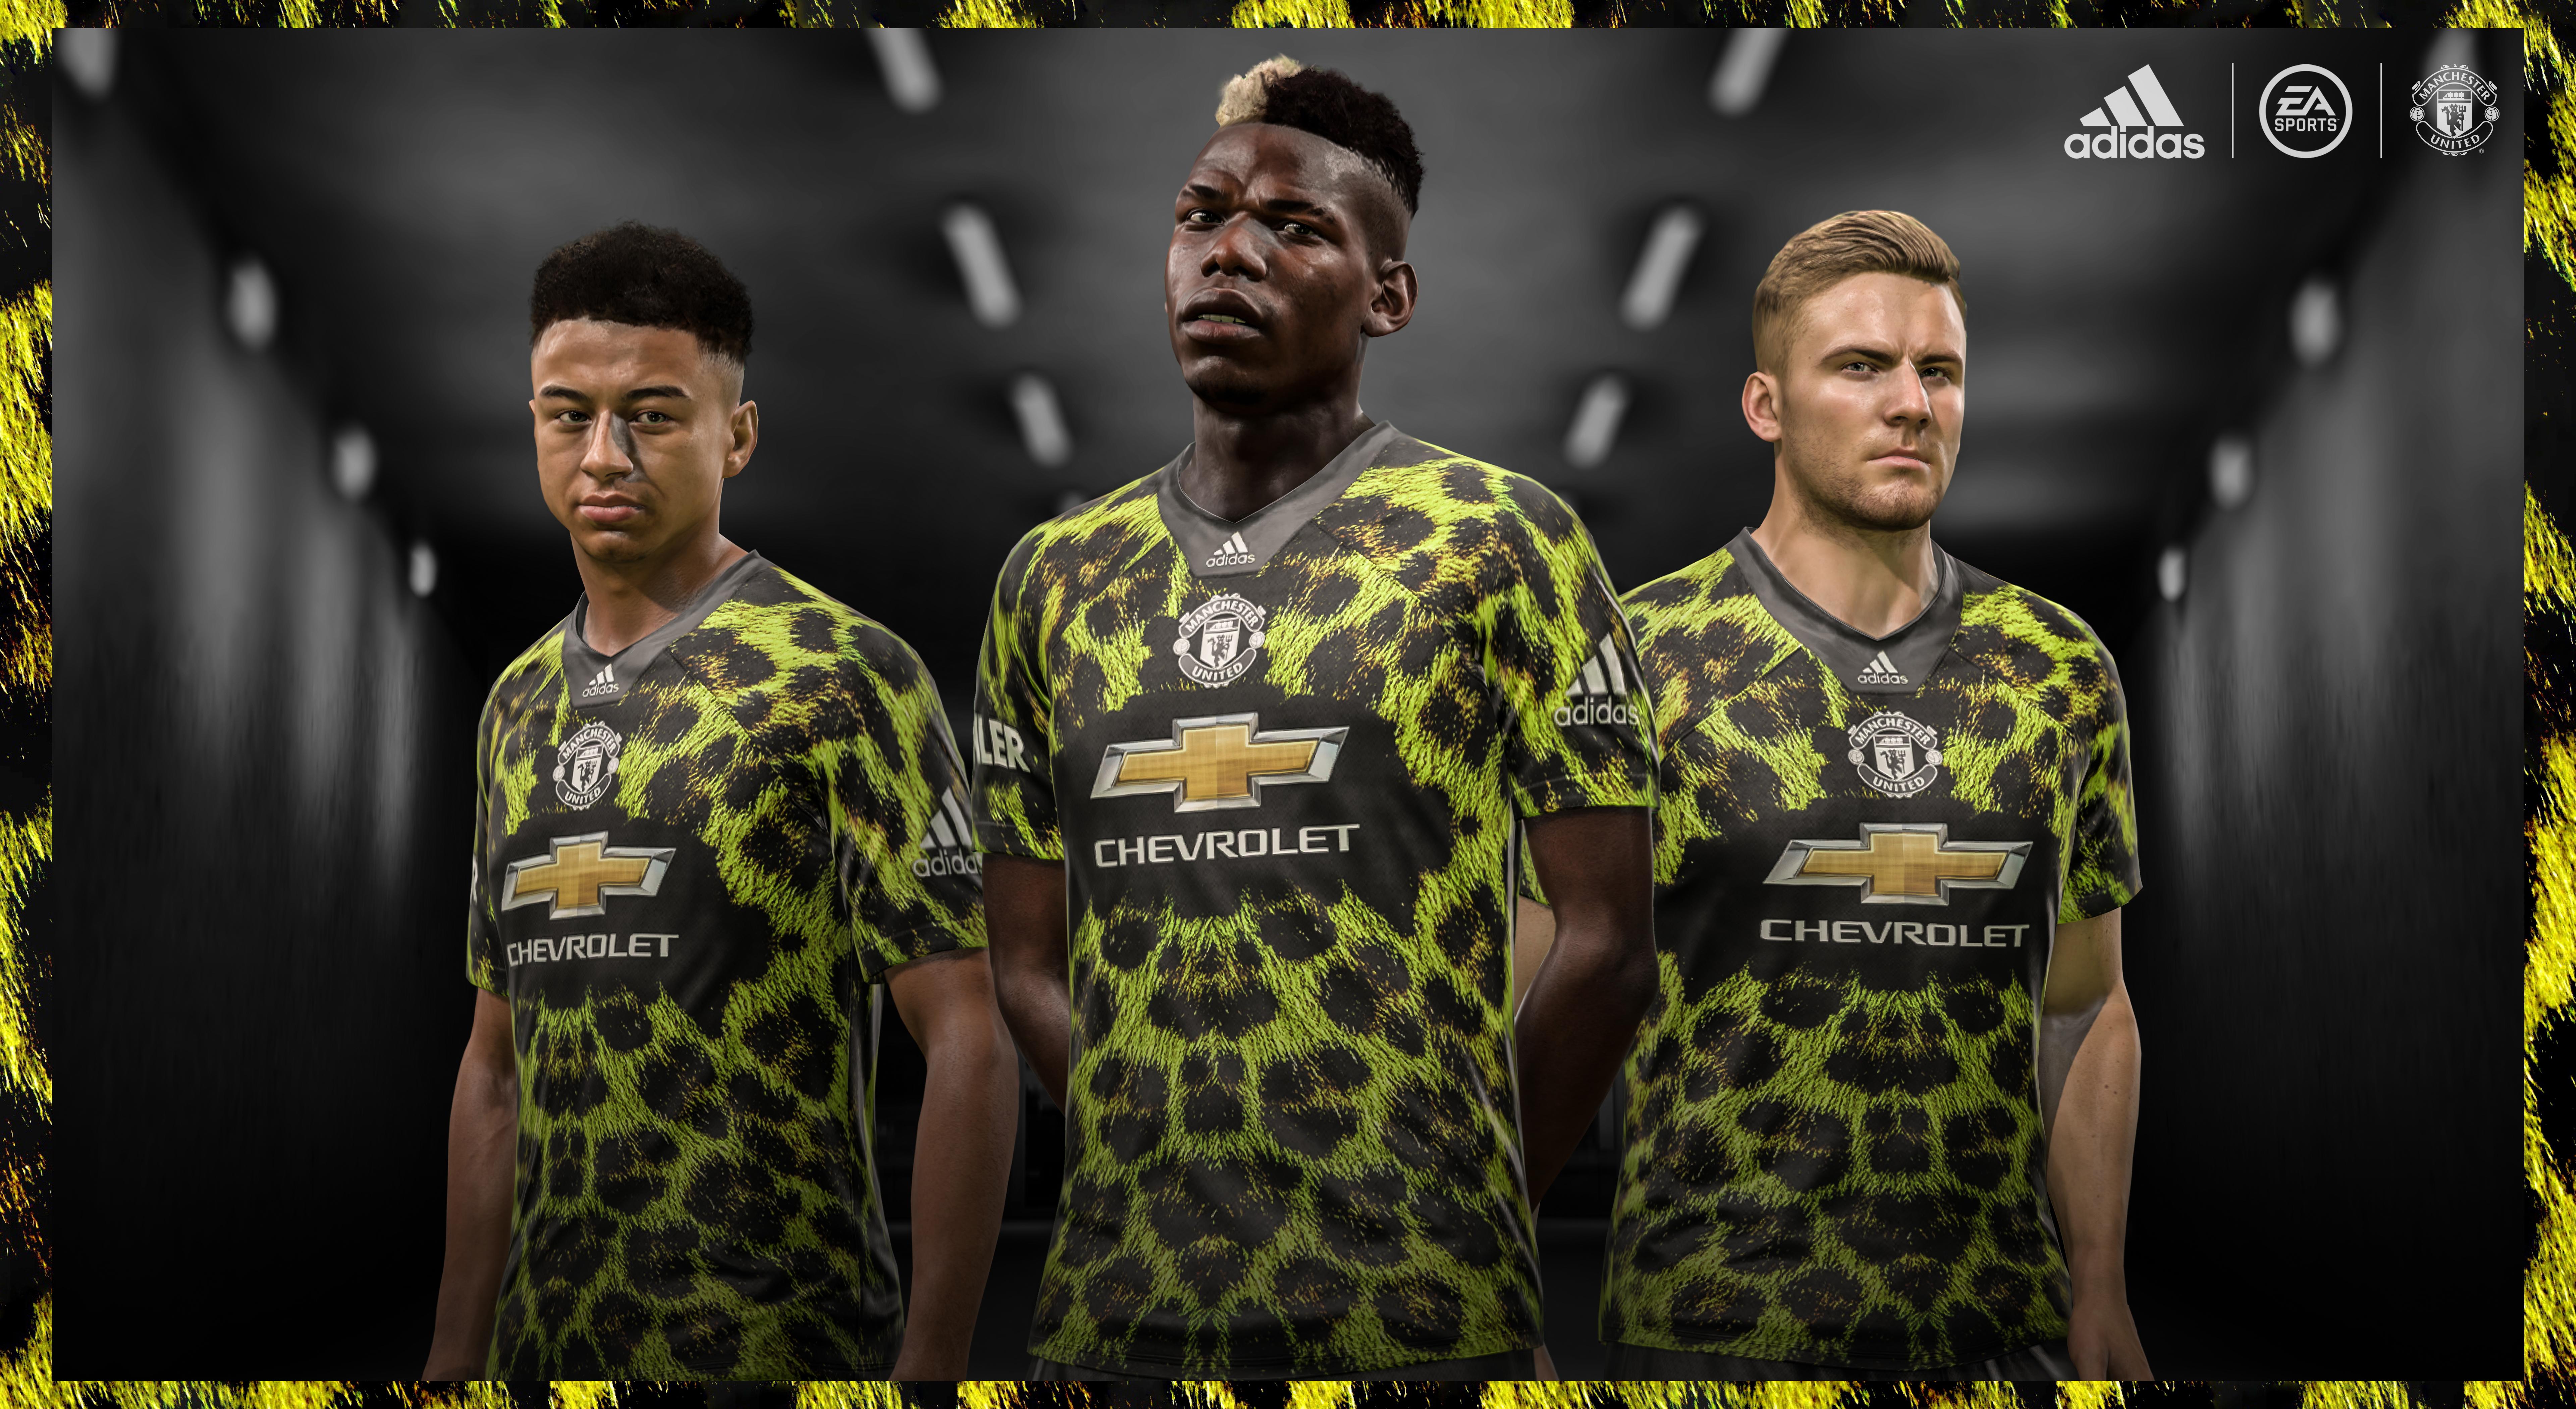 0ad3e5e95 EA Sports   Adidas Release Limited Edition FIFA 19 Jersey Collection ...